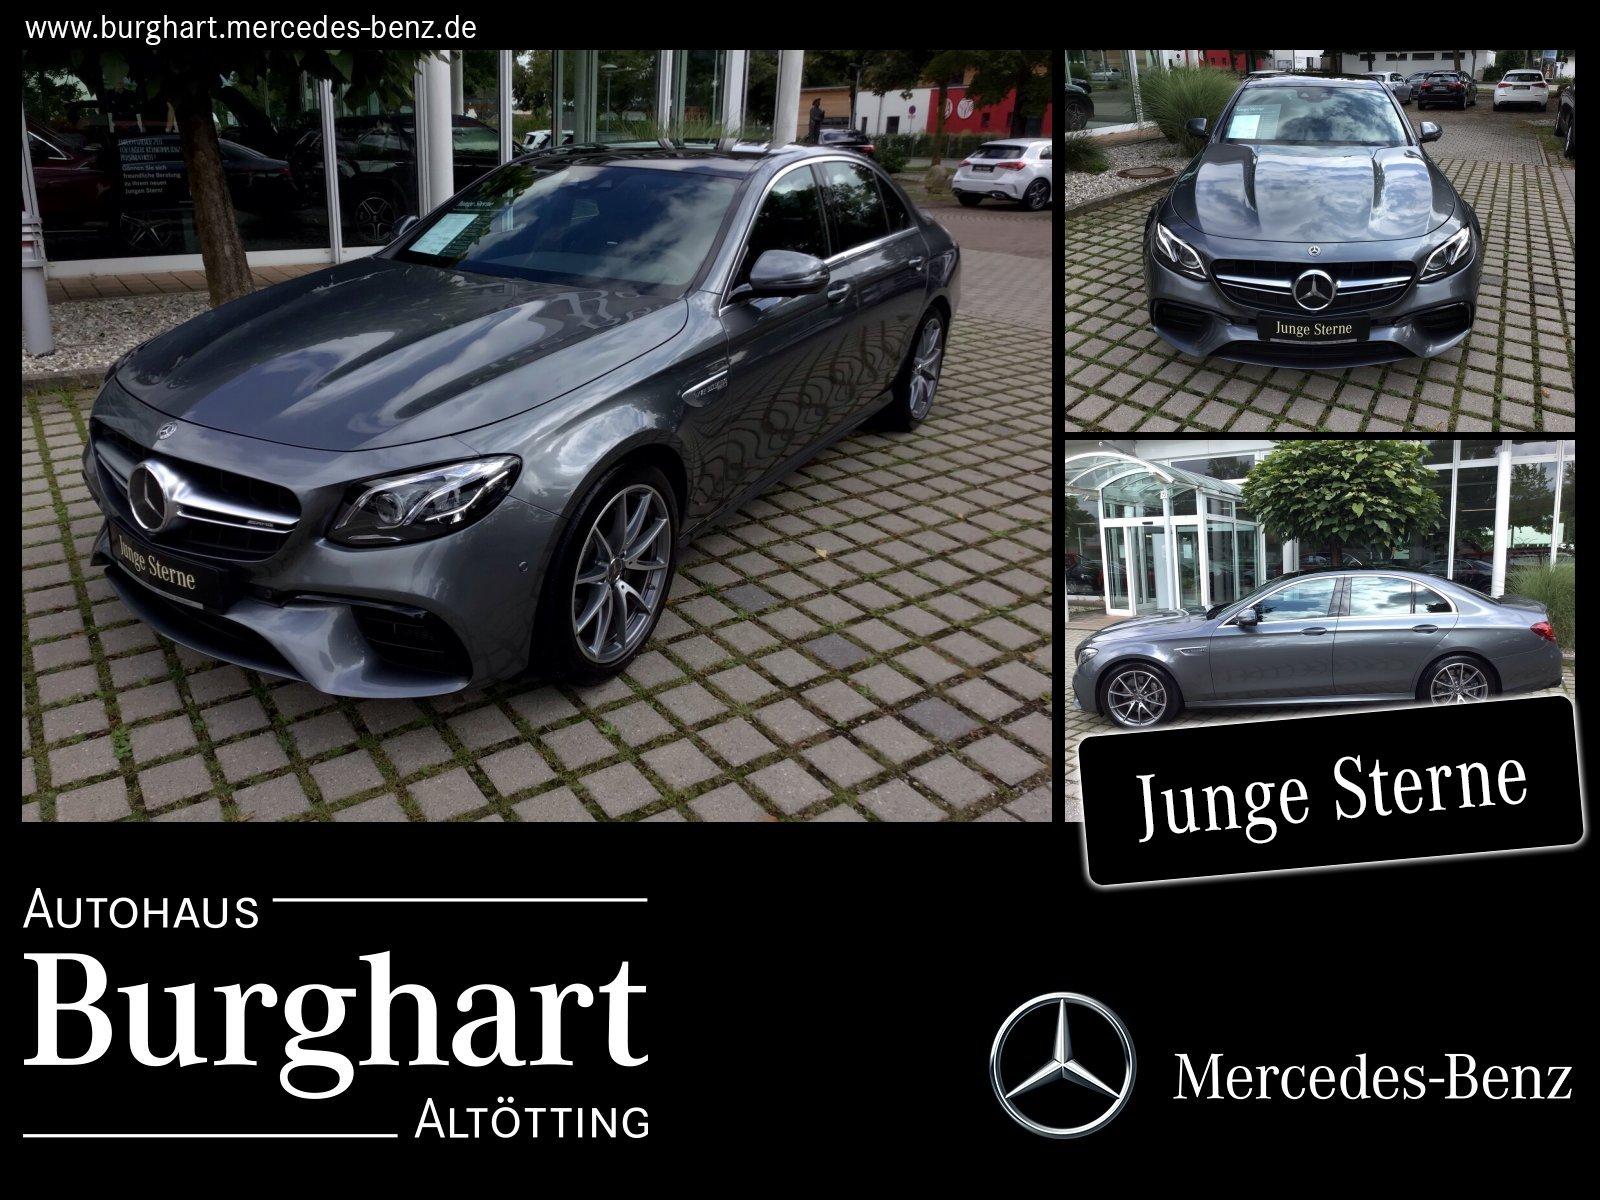 Mercedes-Benz Mercedes-AMG E 63 4M+ PanoDach/COMAND/Distronic, Jahr 2019, Benzin